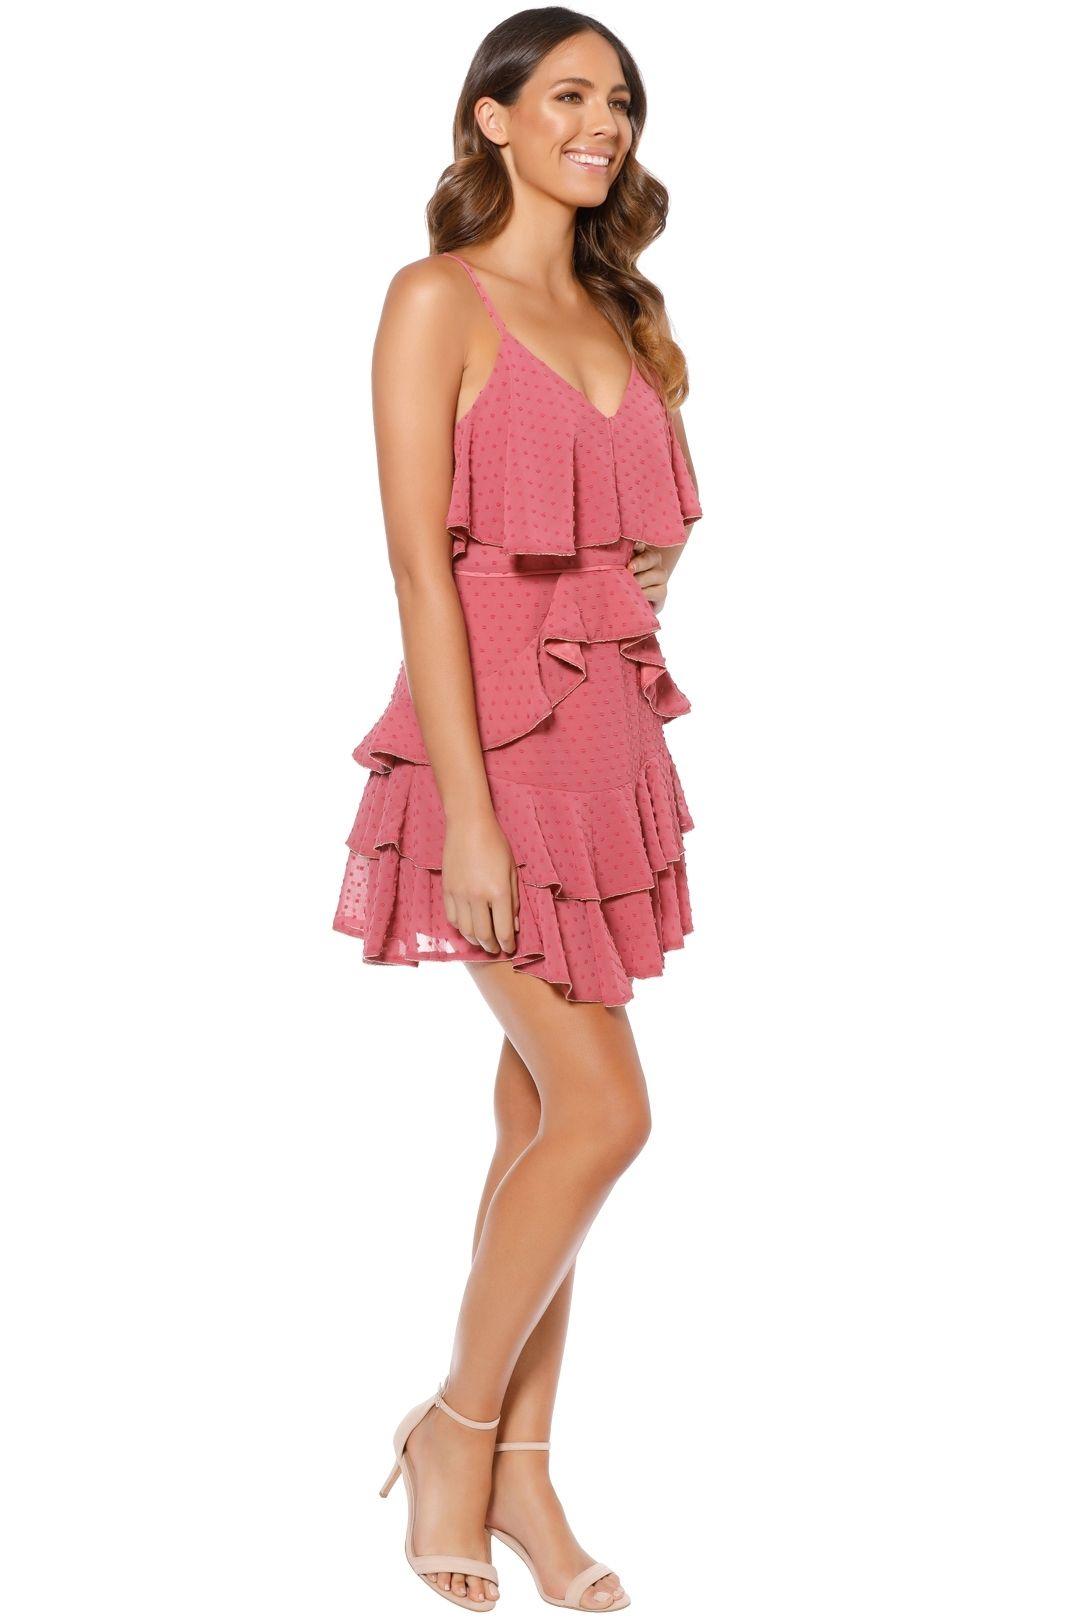 Talulah - Soft Posey Mini Dress - Pink - Side